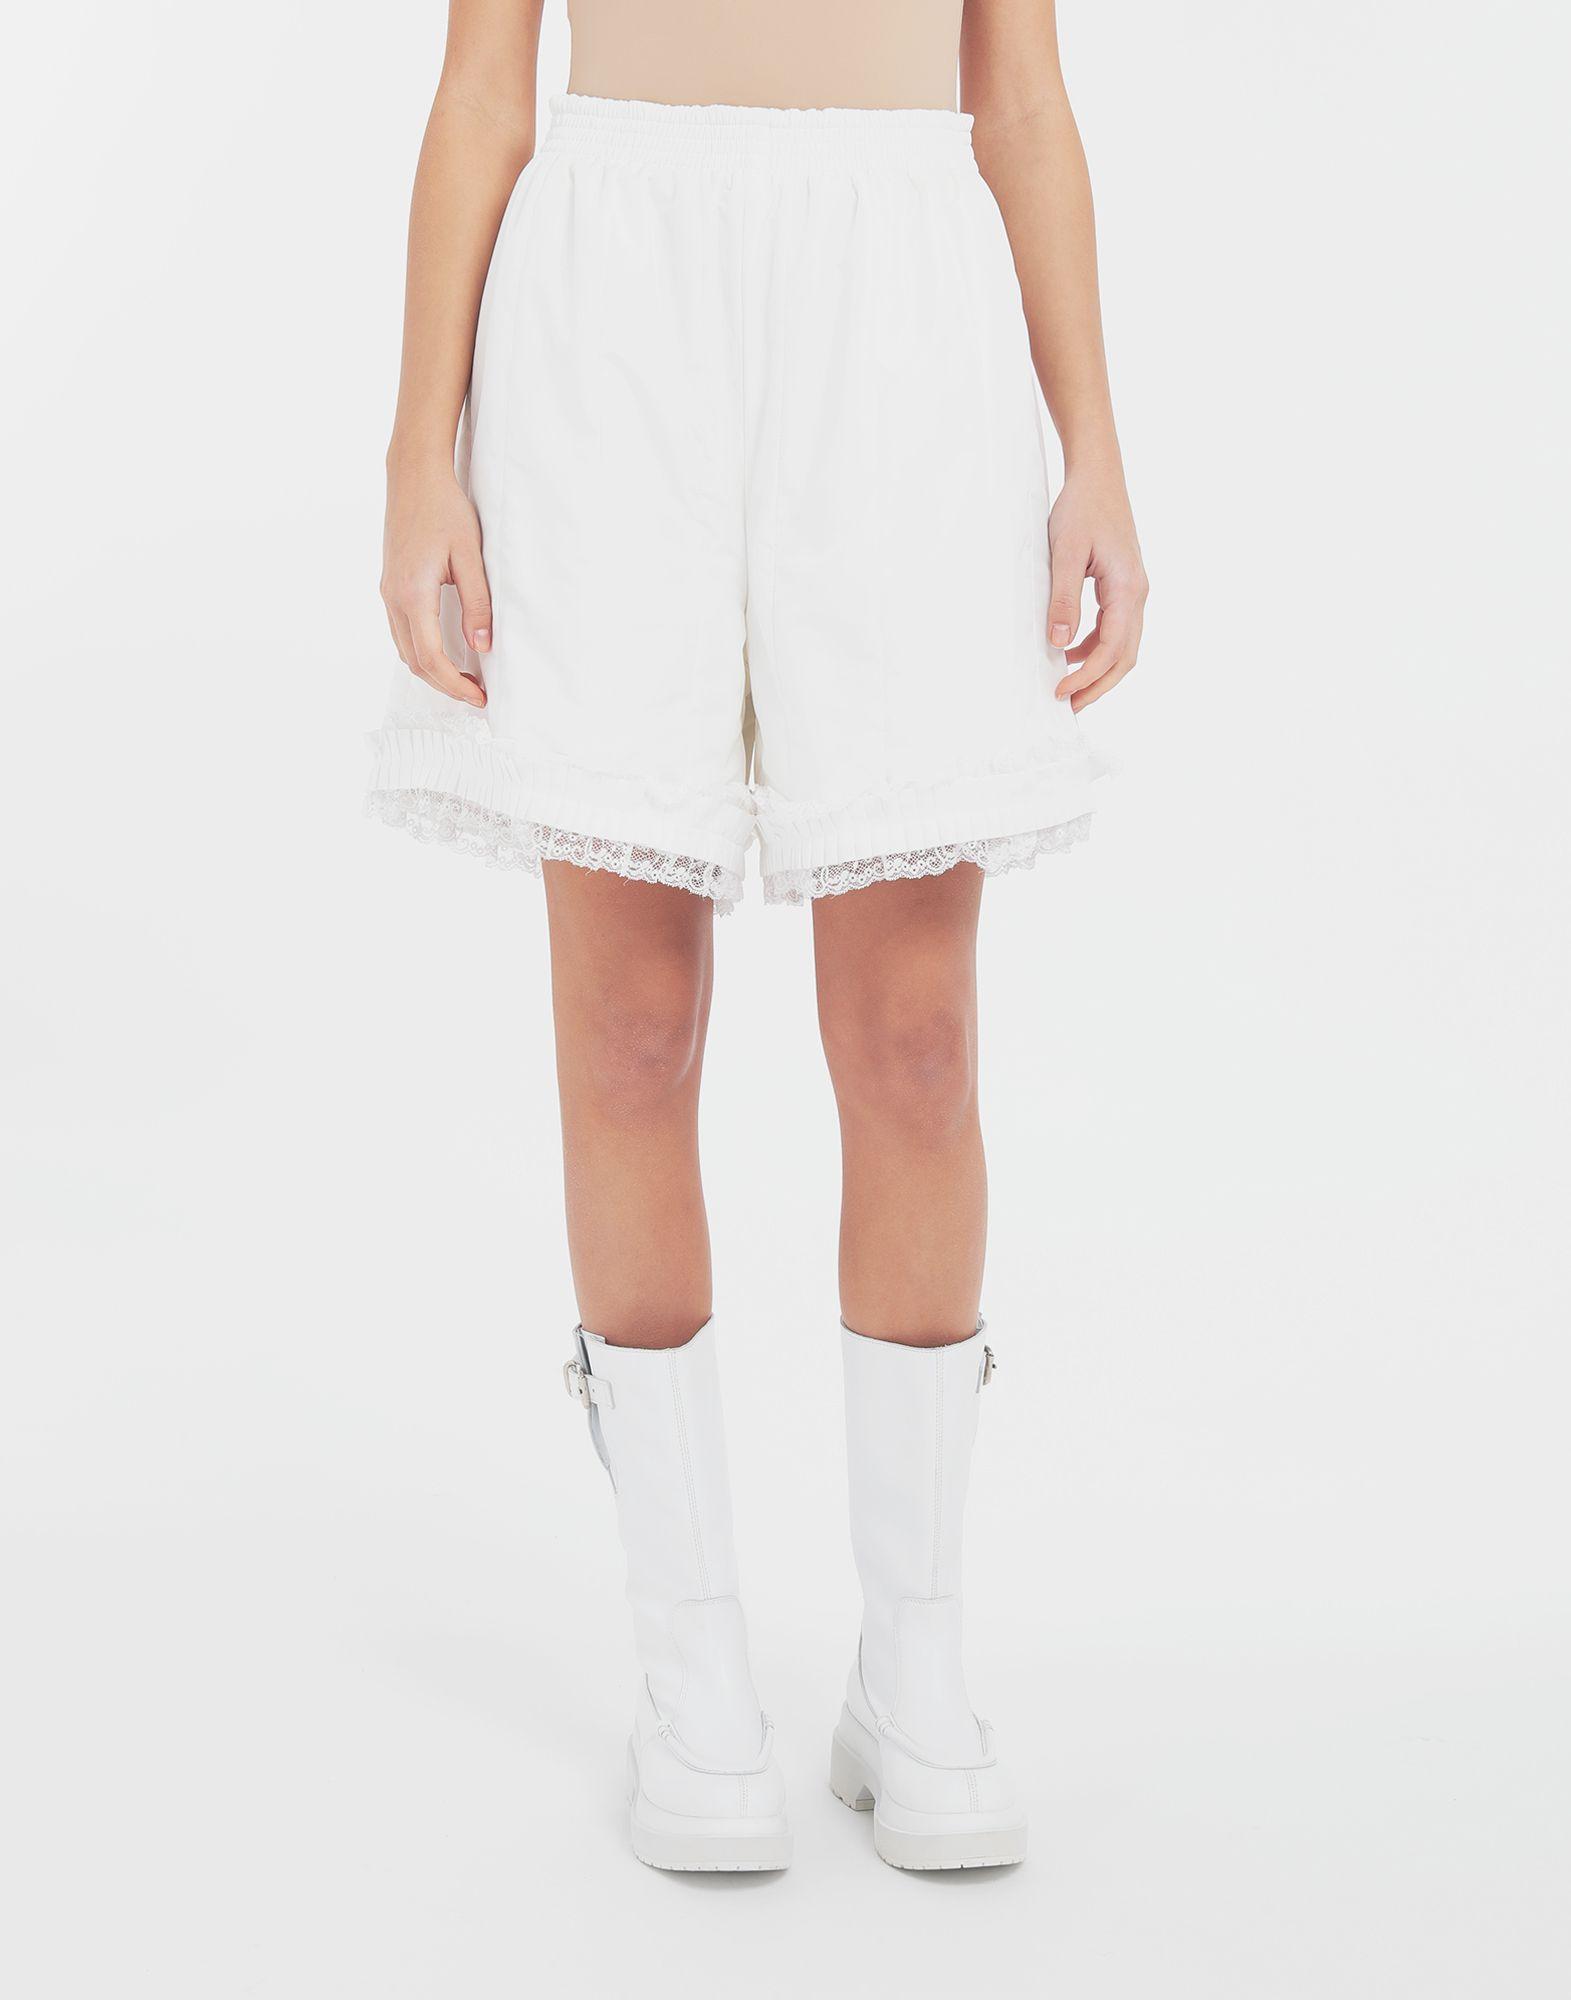 MM6 MAISON MARGIELA Lace-trimmed jersey shorts Shorts Woman r